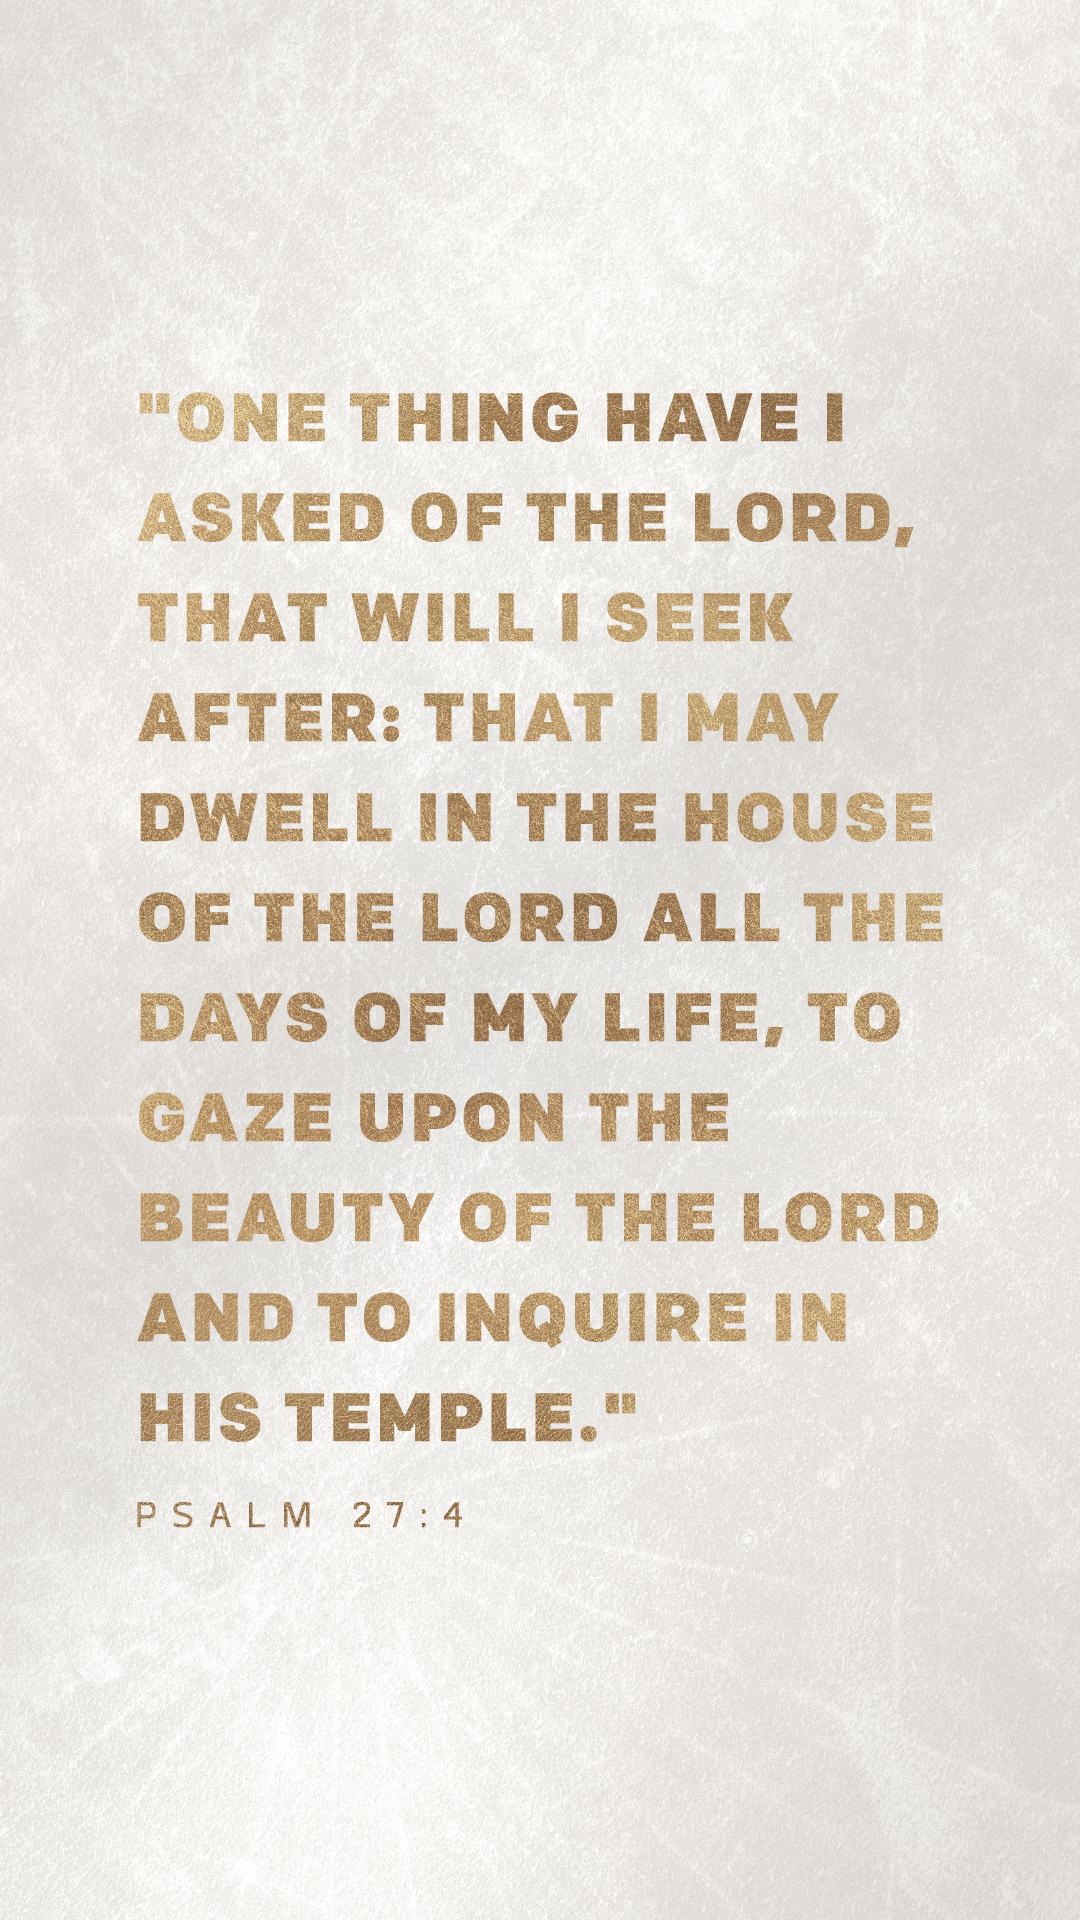 Verse Ps 27:4 (JPG)